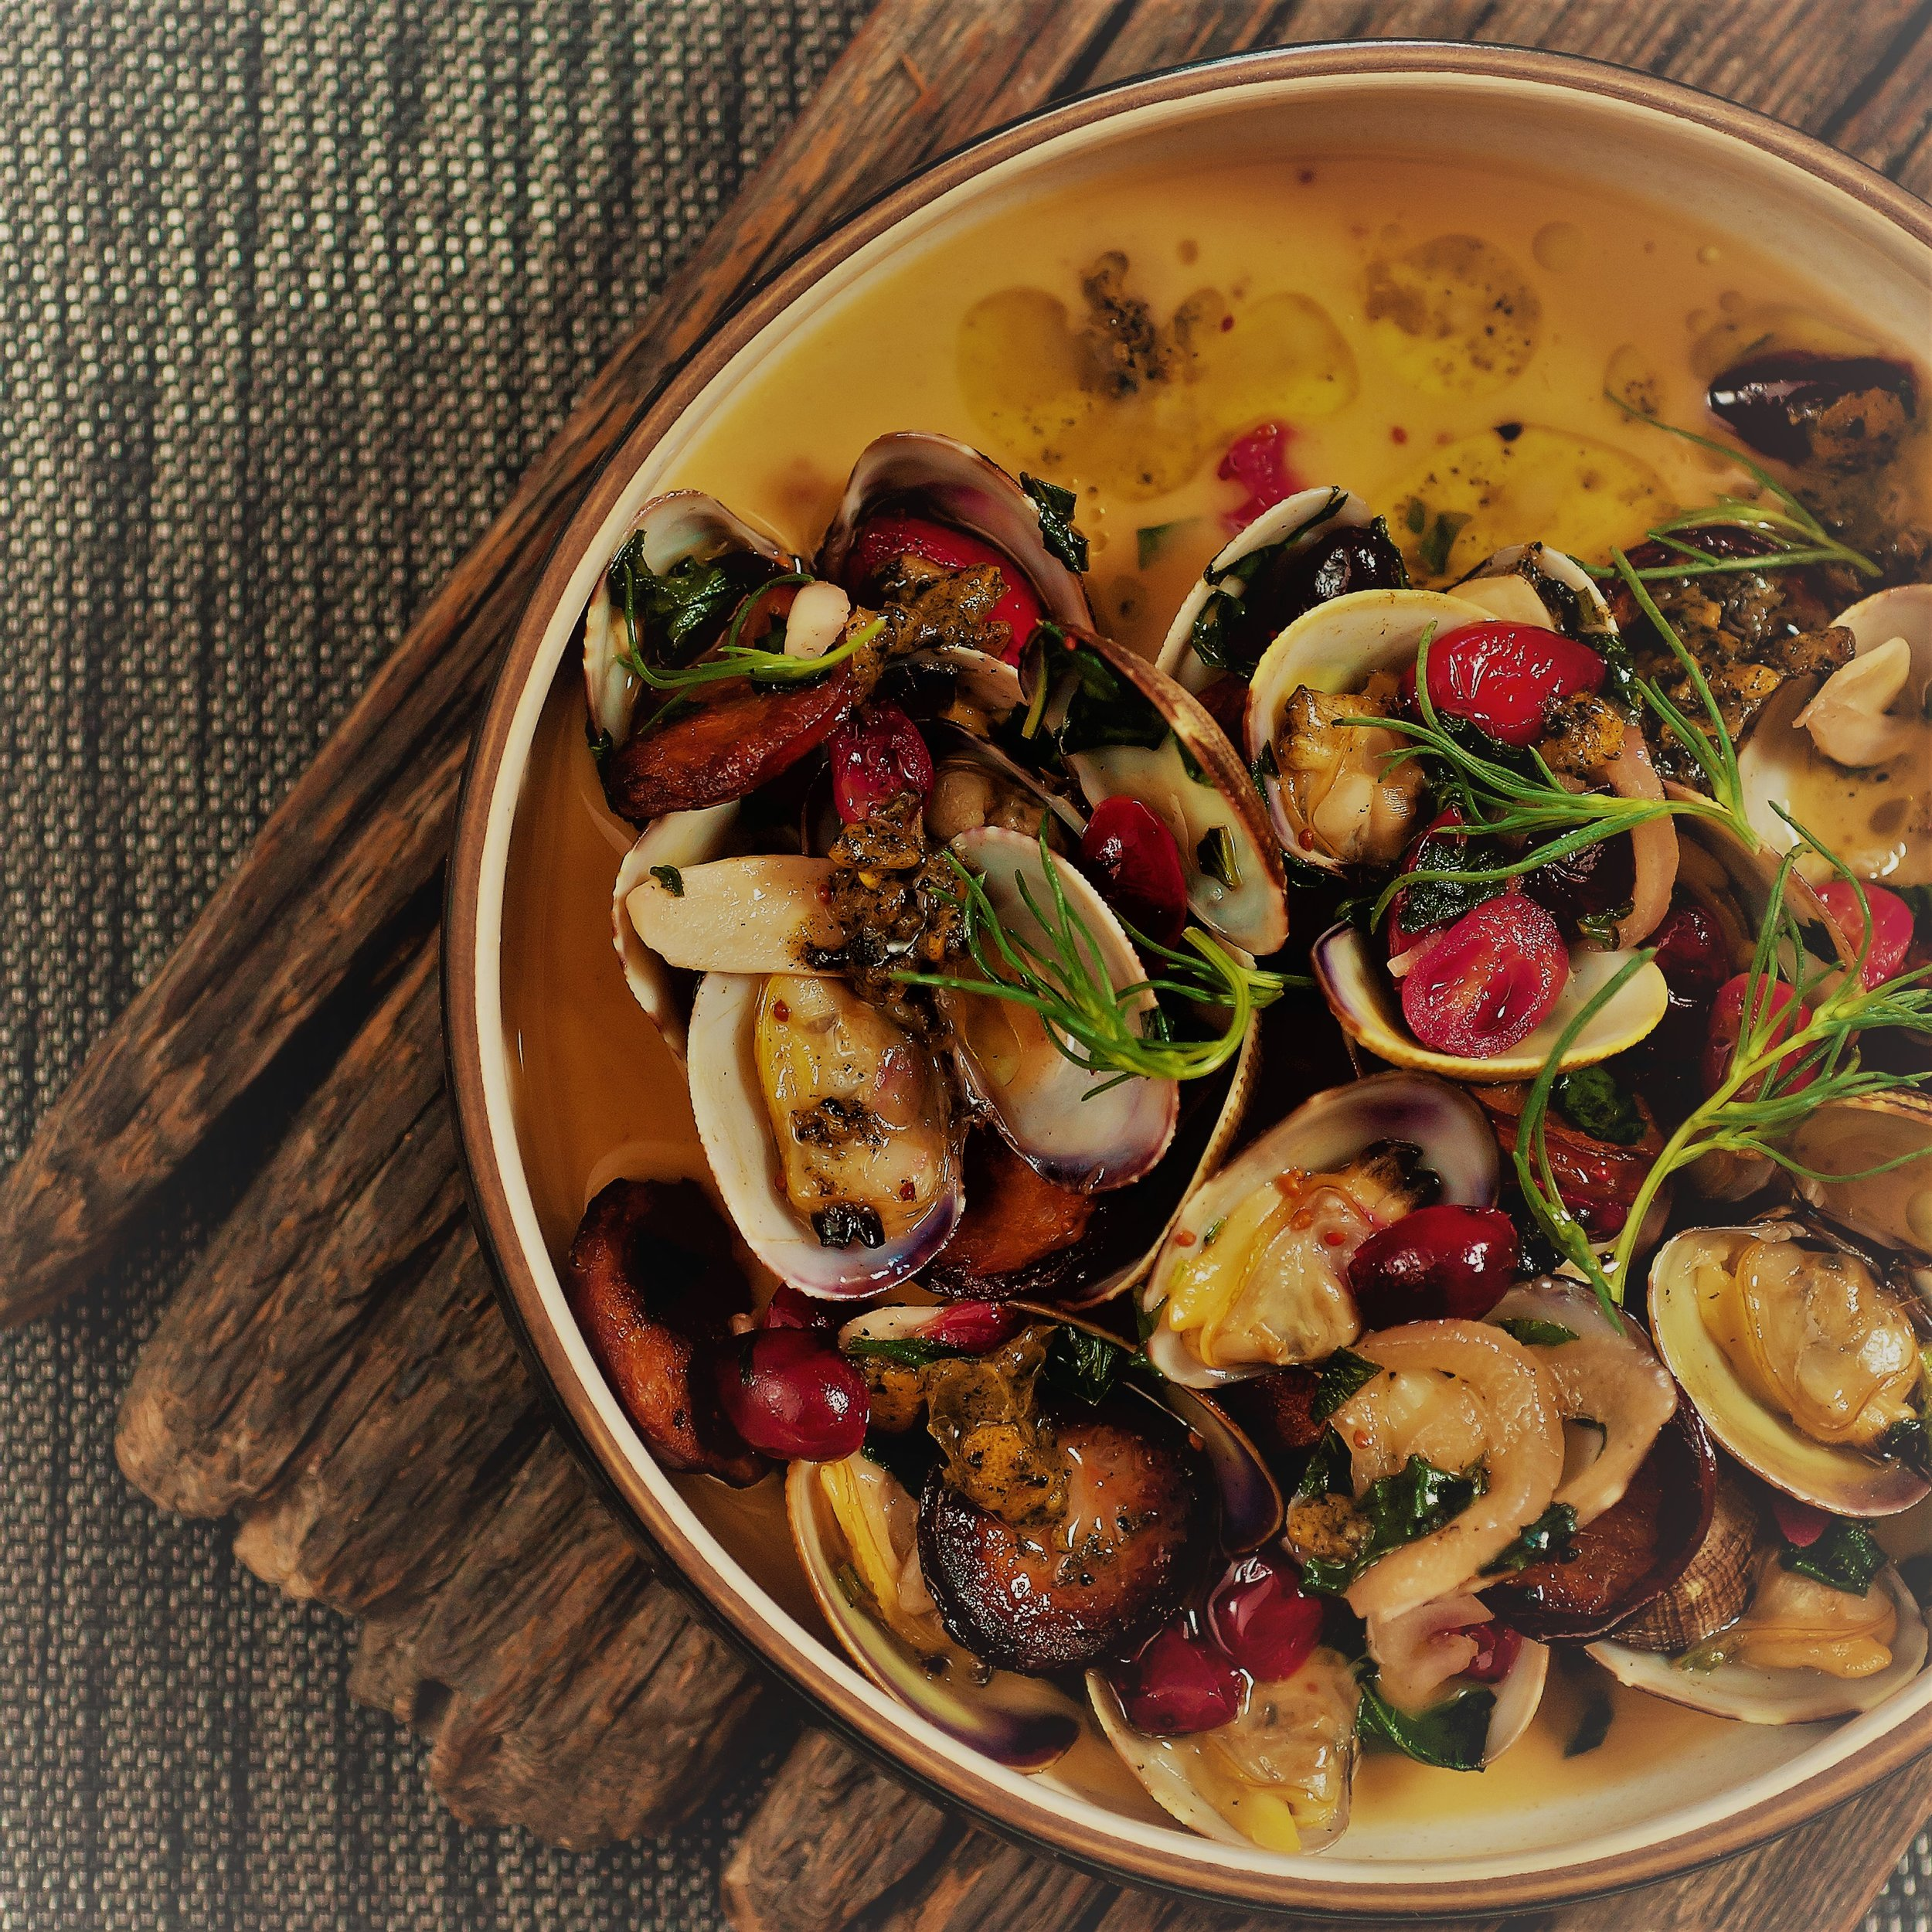 manila clams, chorizo, cranberry, burnt garlic, madeira